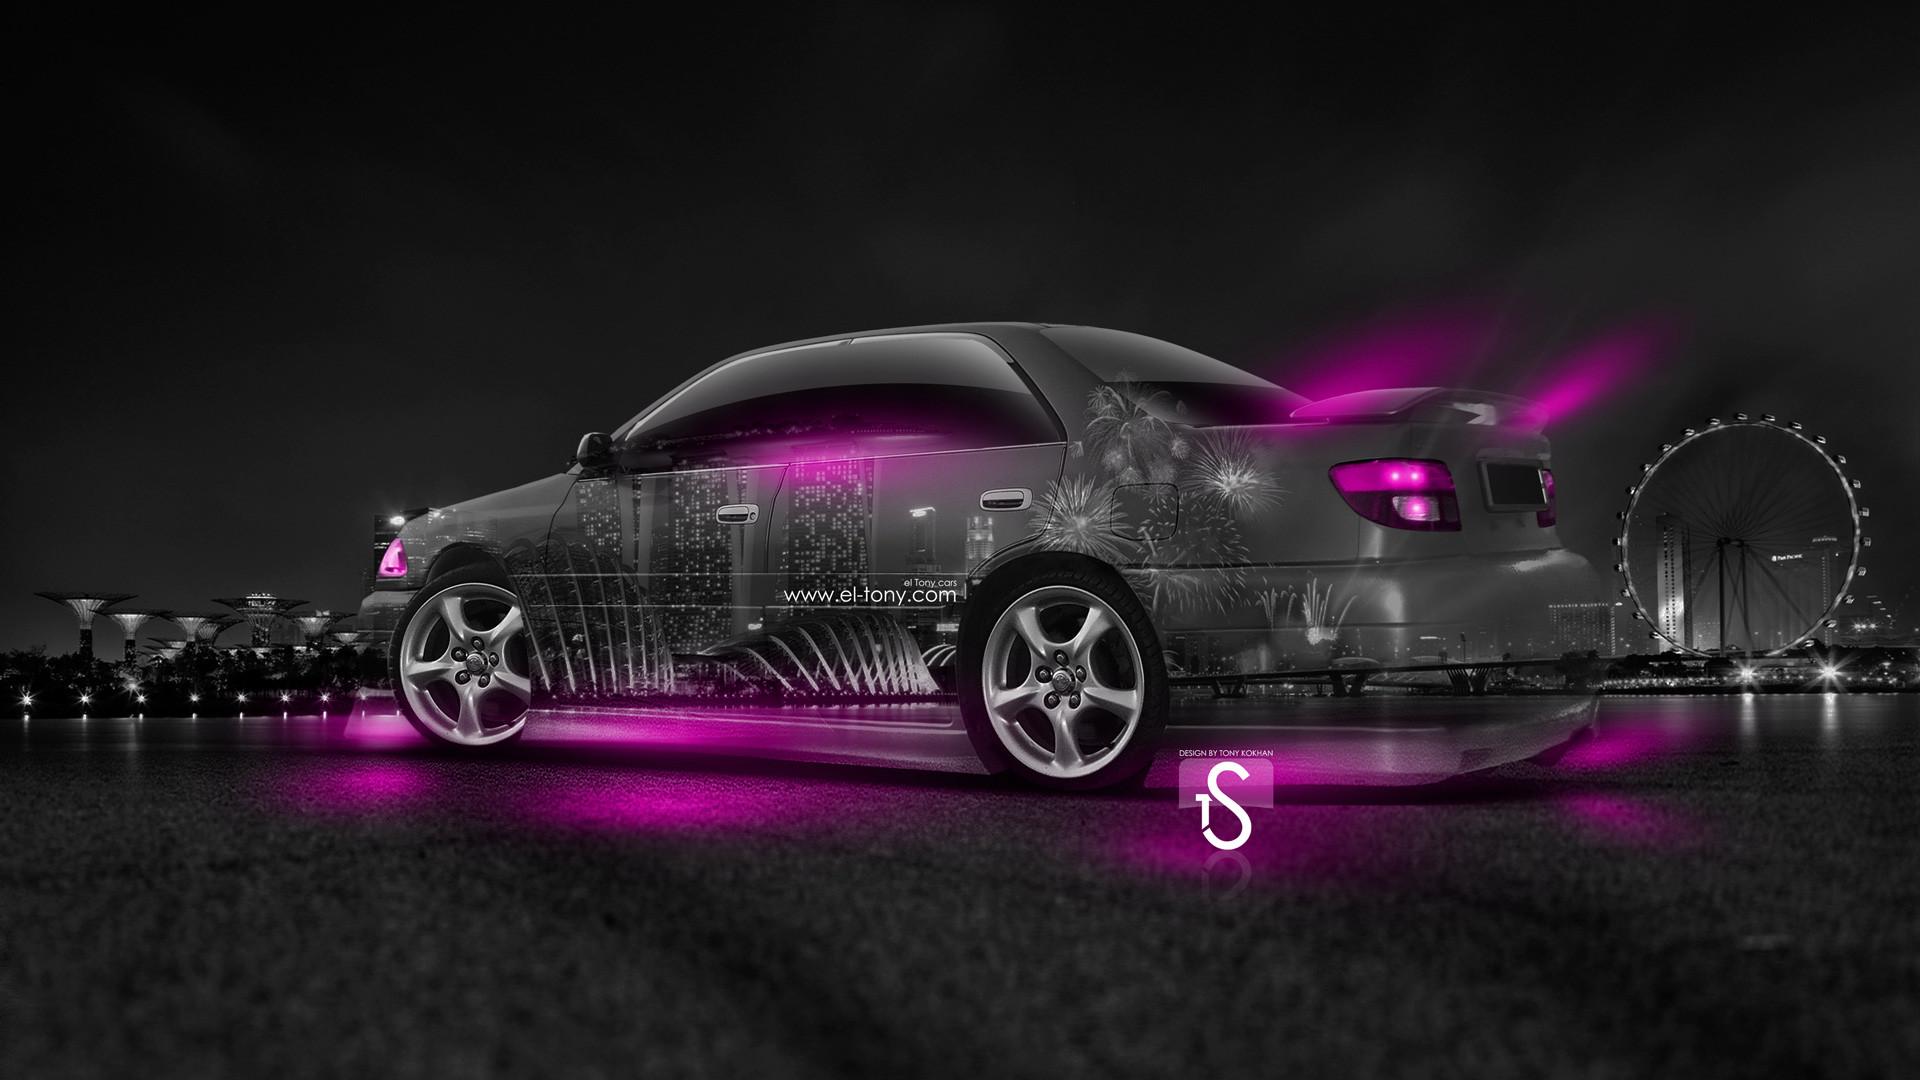 … Toyota-Carina-GT-TRD-JDM-Crystal-City-Car-